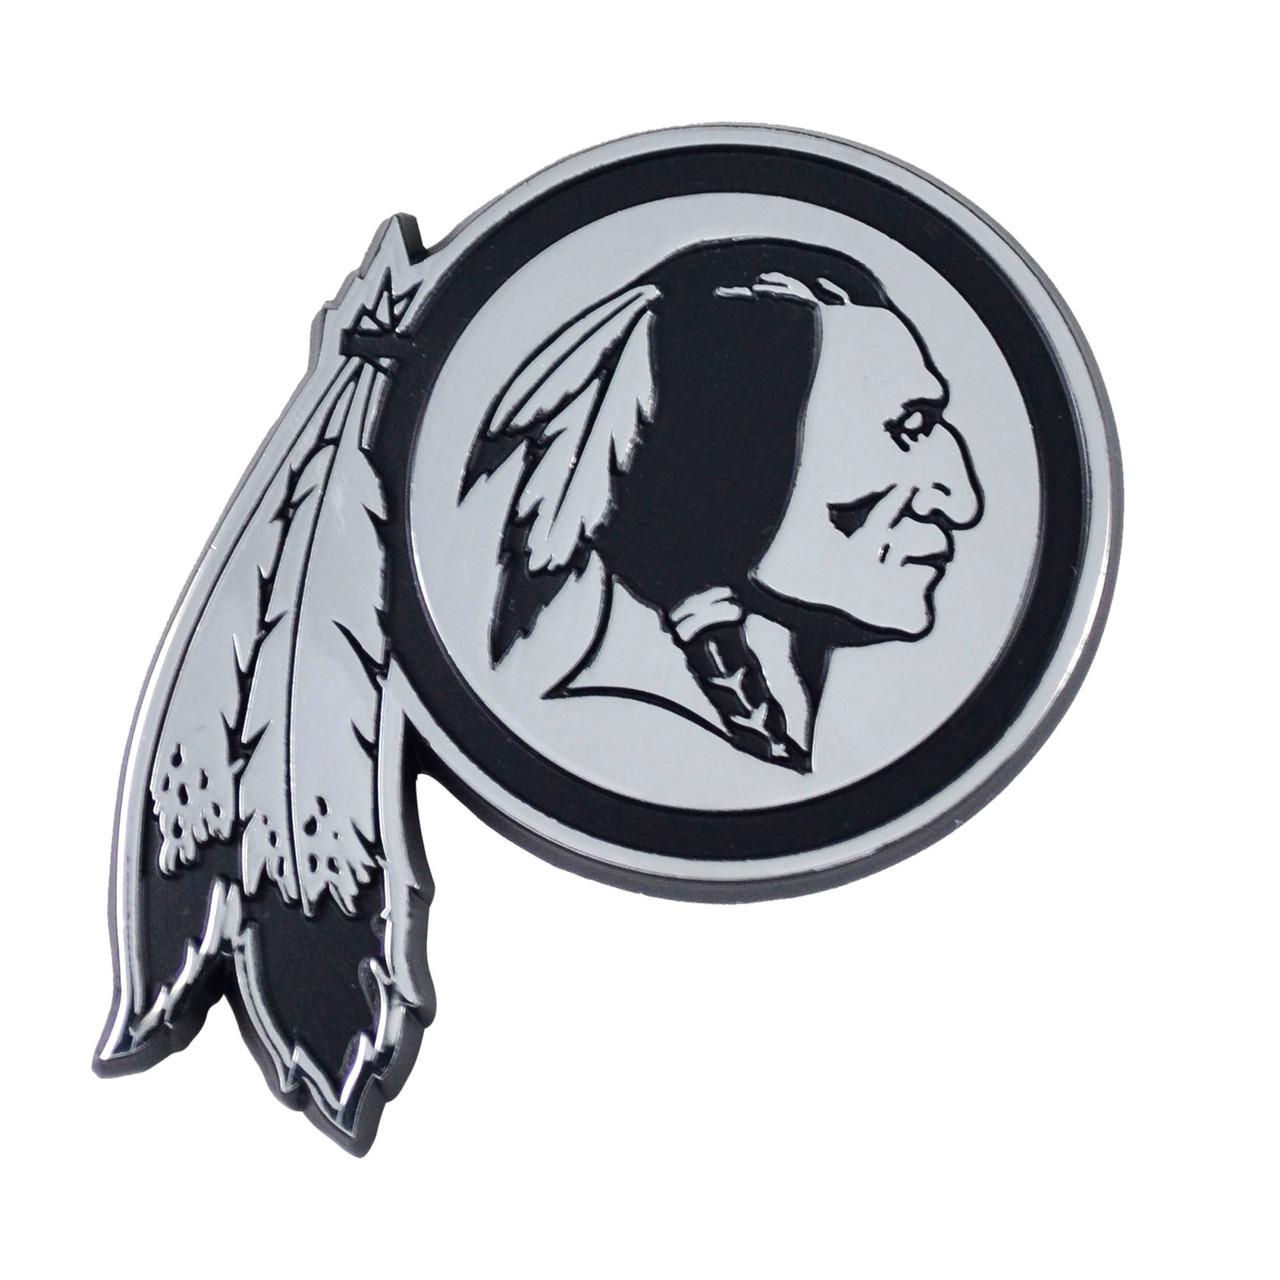 Washington Redskins Auto Emblem Premium Metal Chrome